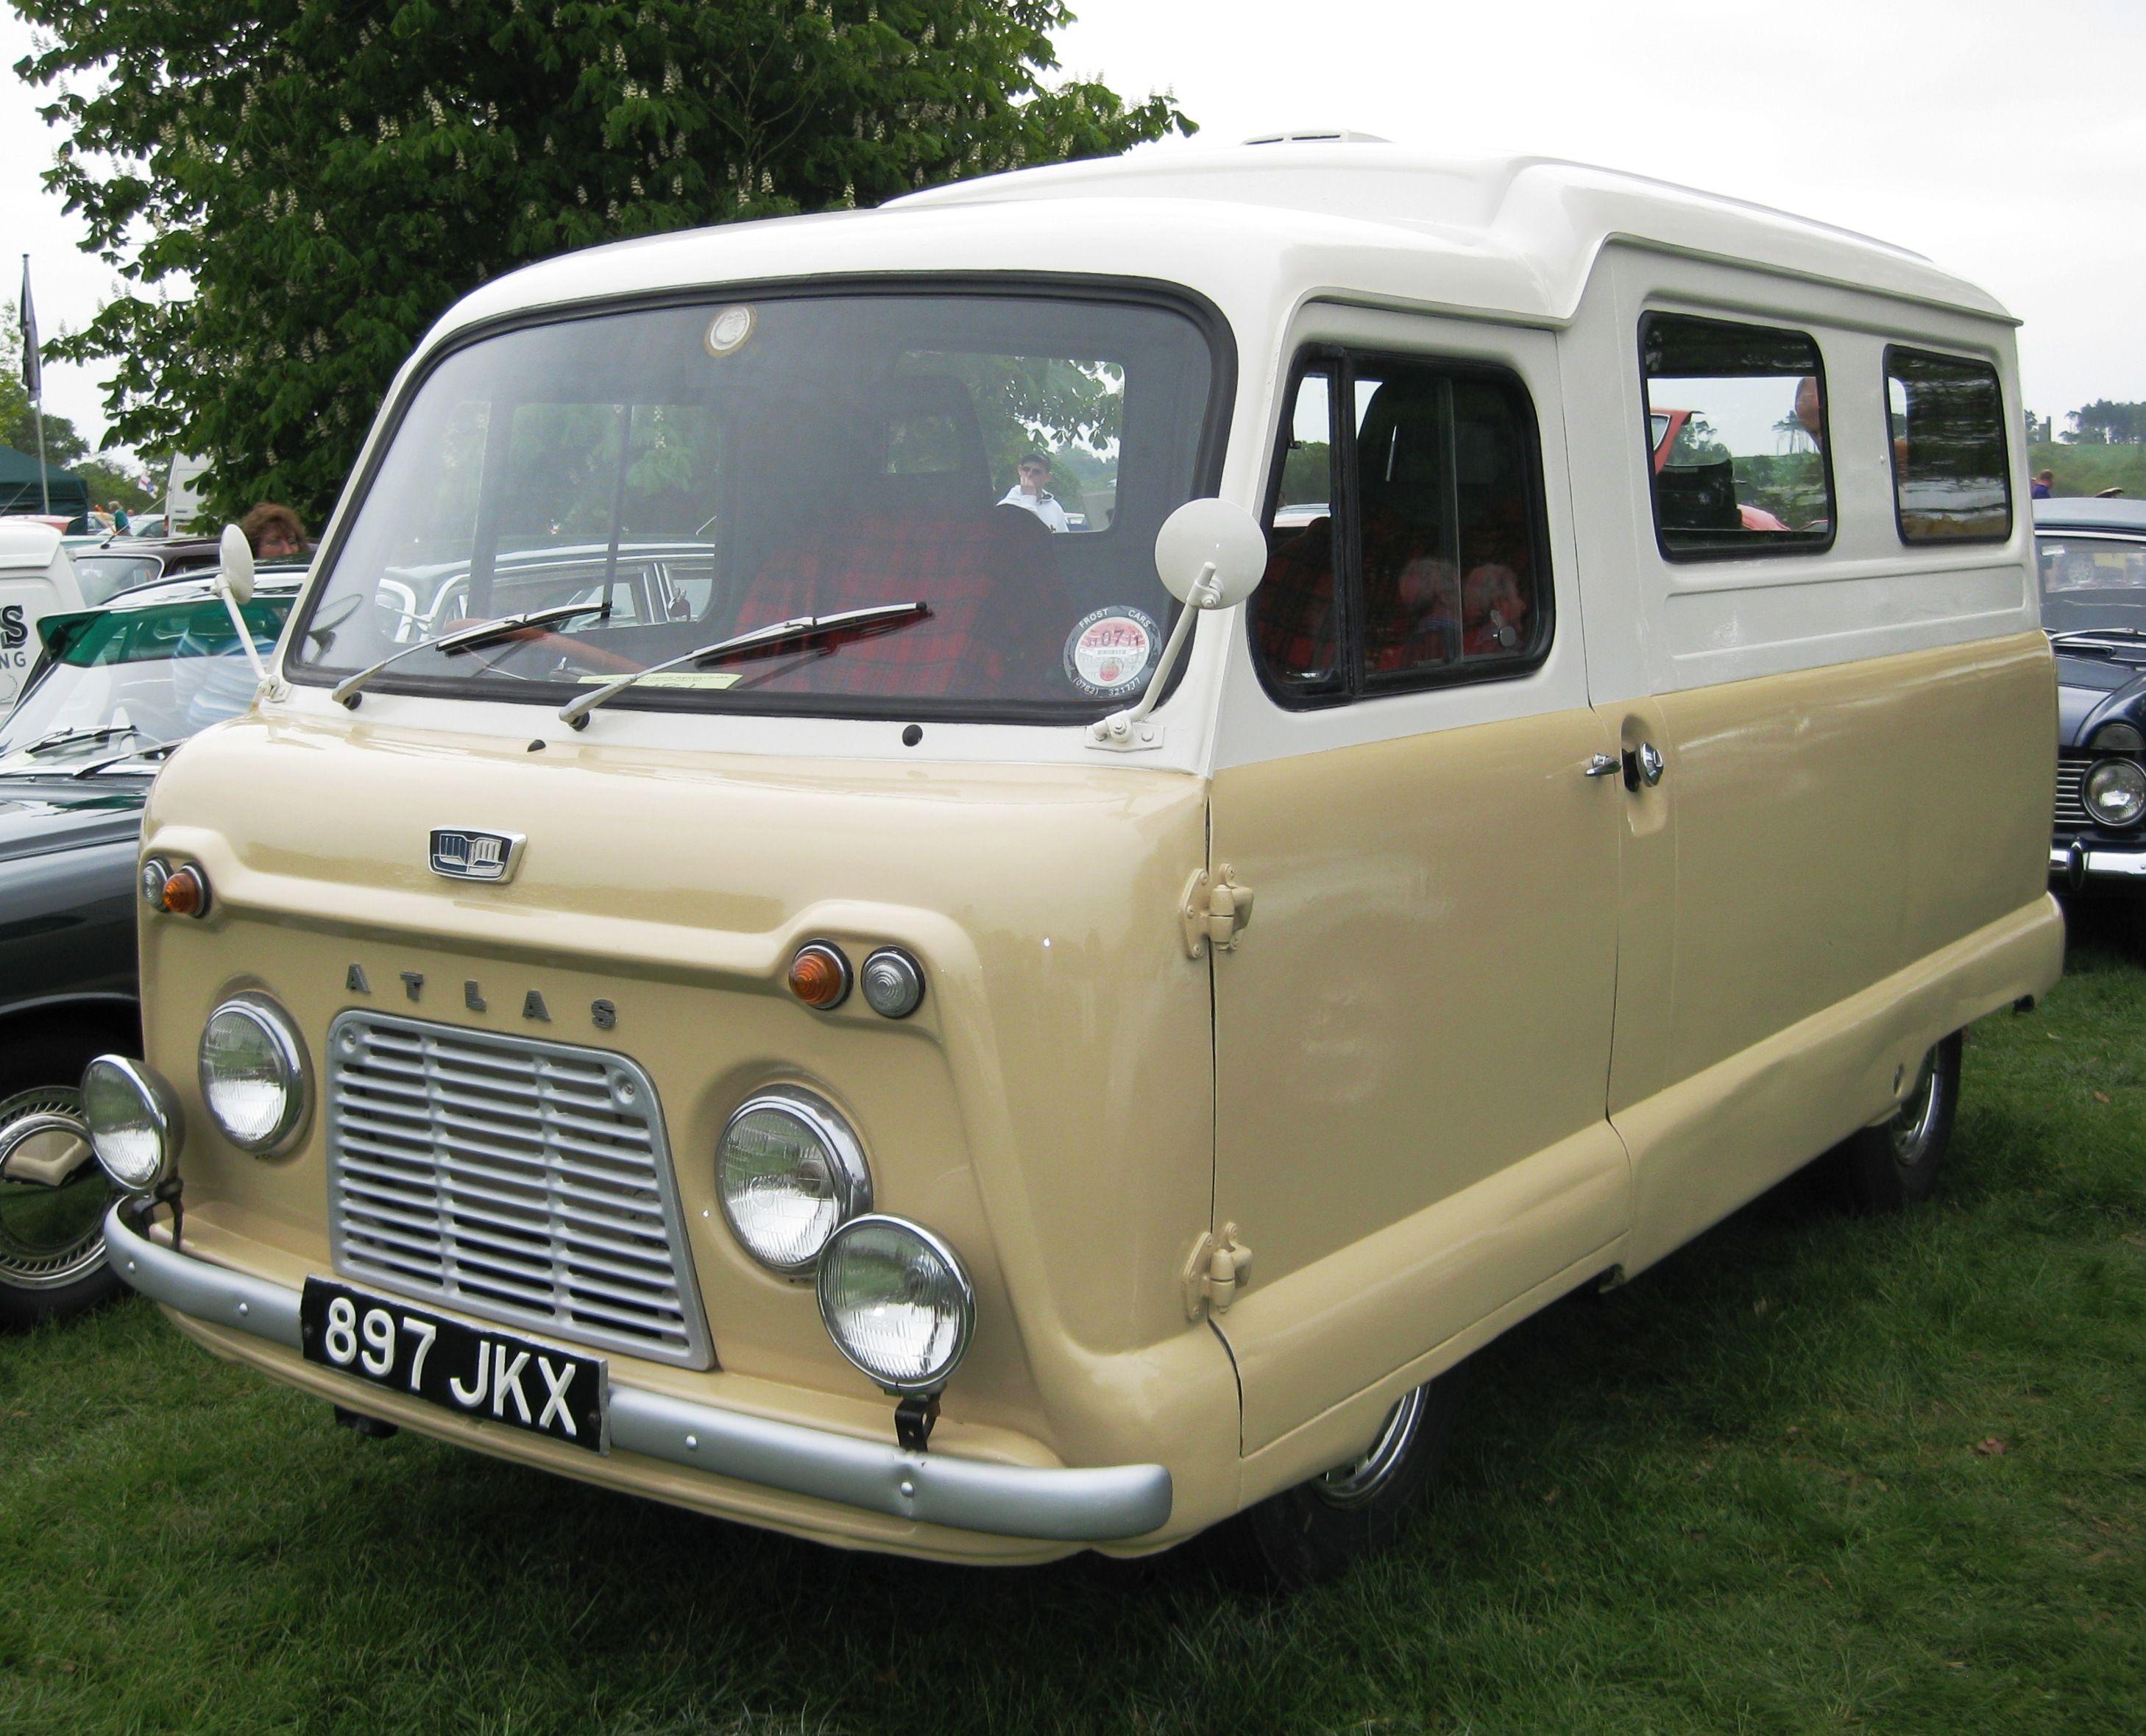 Atlas van with side windows first registered september 1959